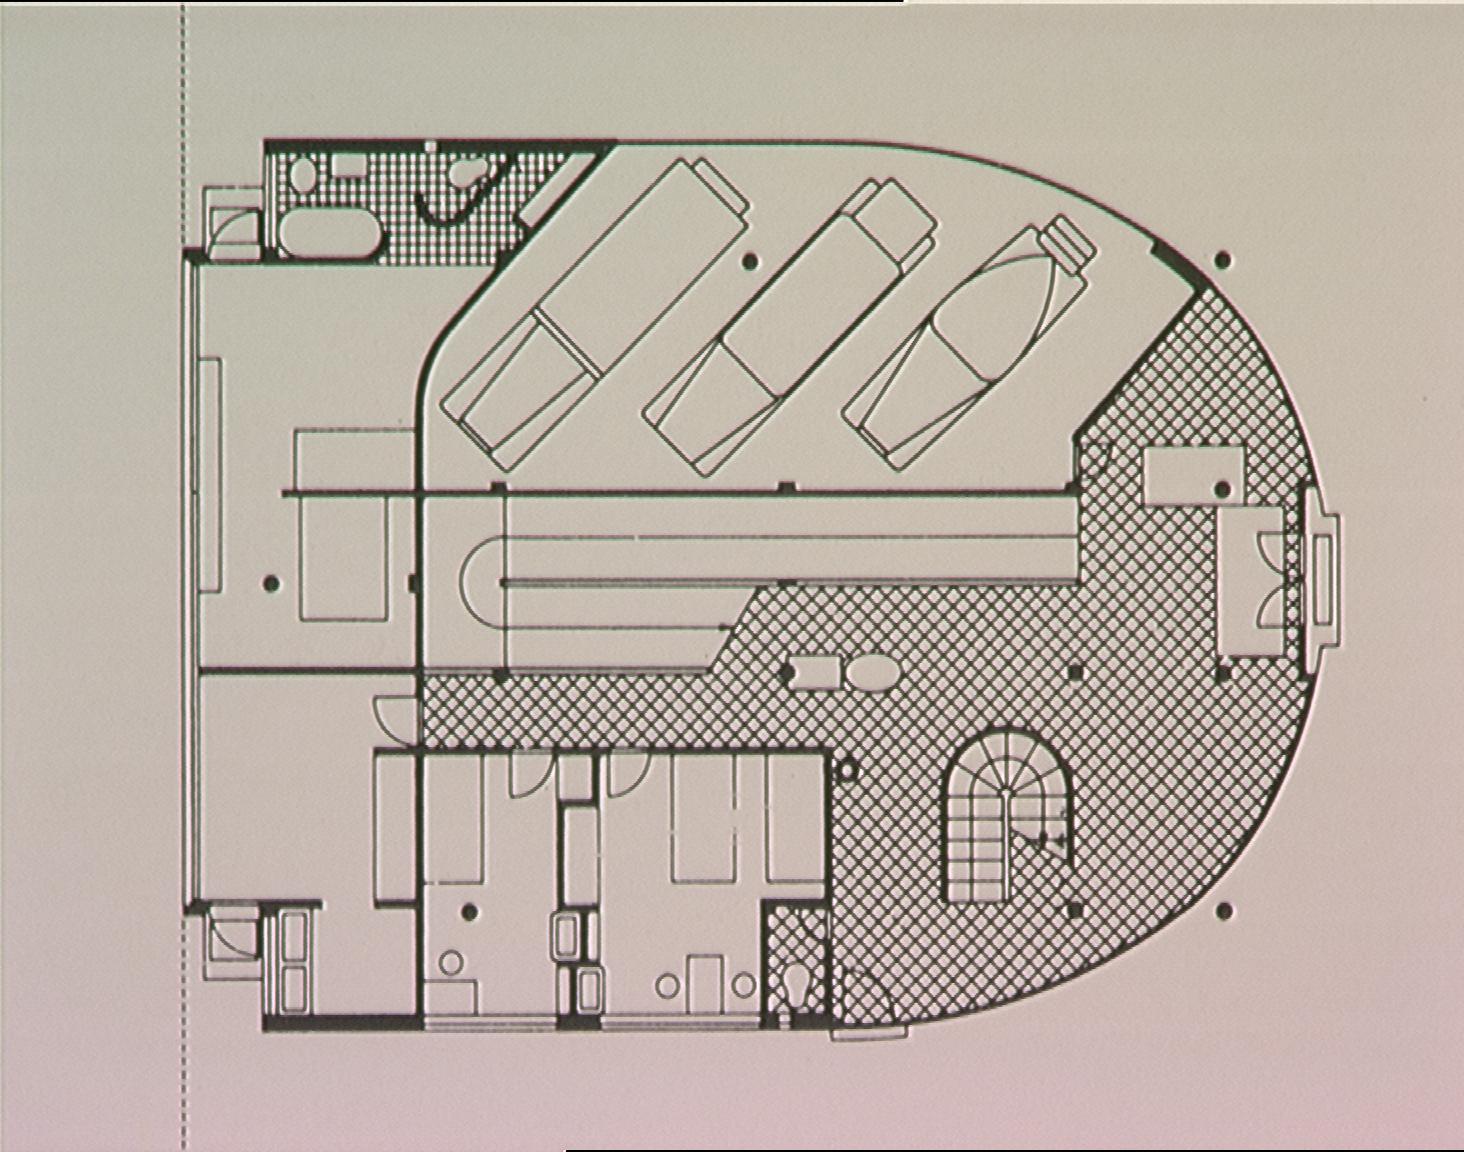 Villa Savoye 2nd Floor Plan Villa Savoye Plan of GroundVilla Savoye 2nd Floor Plan